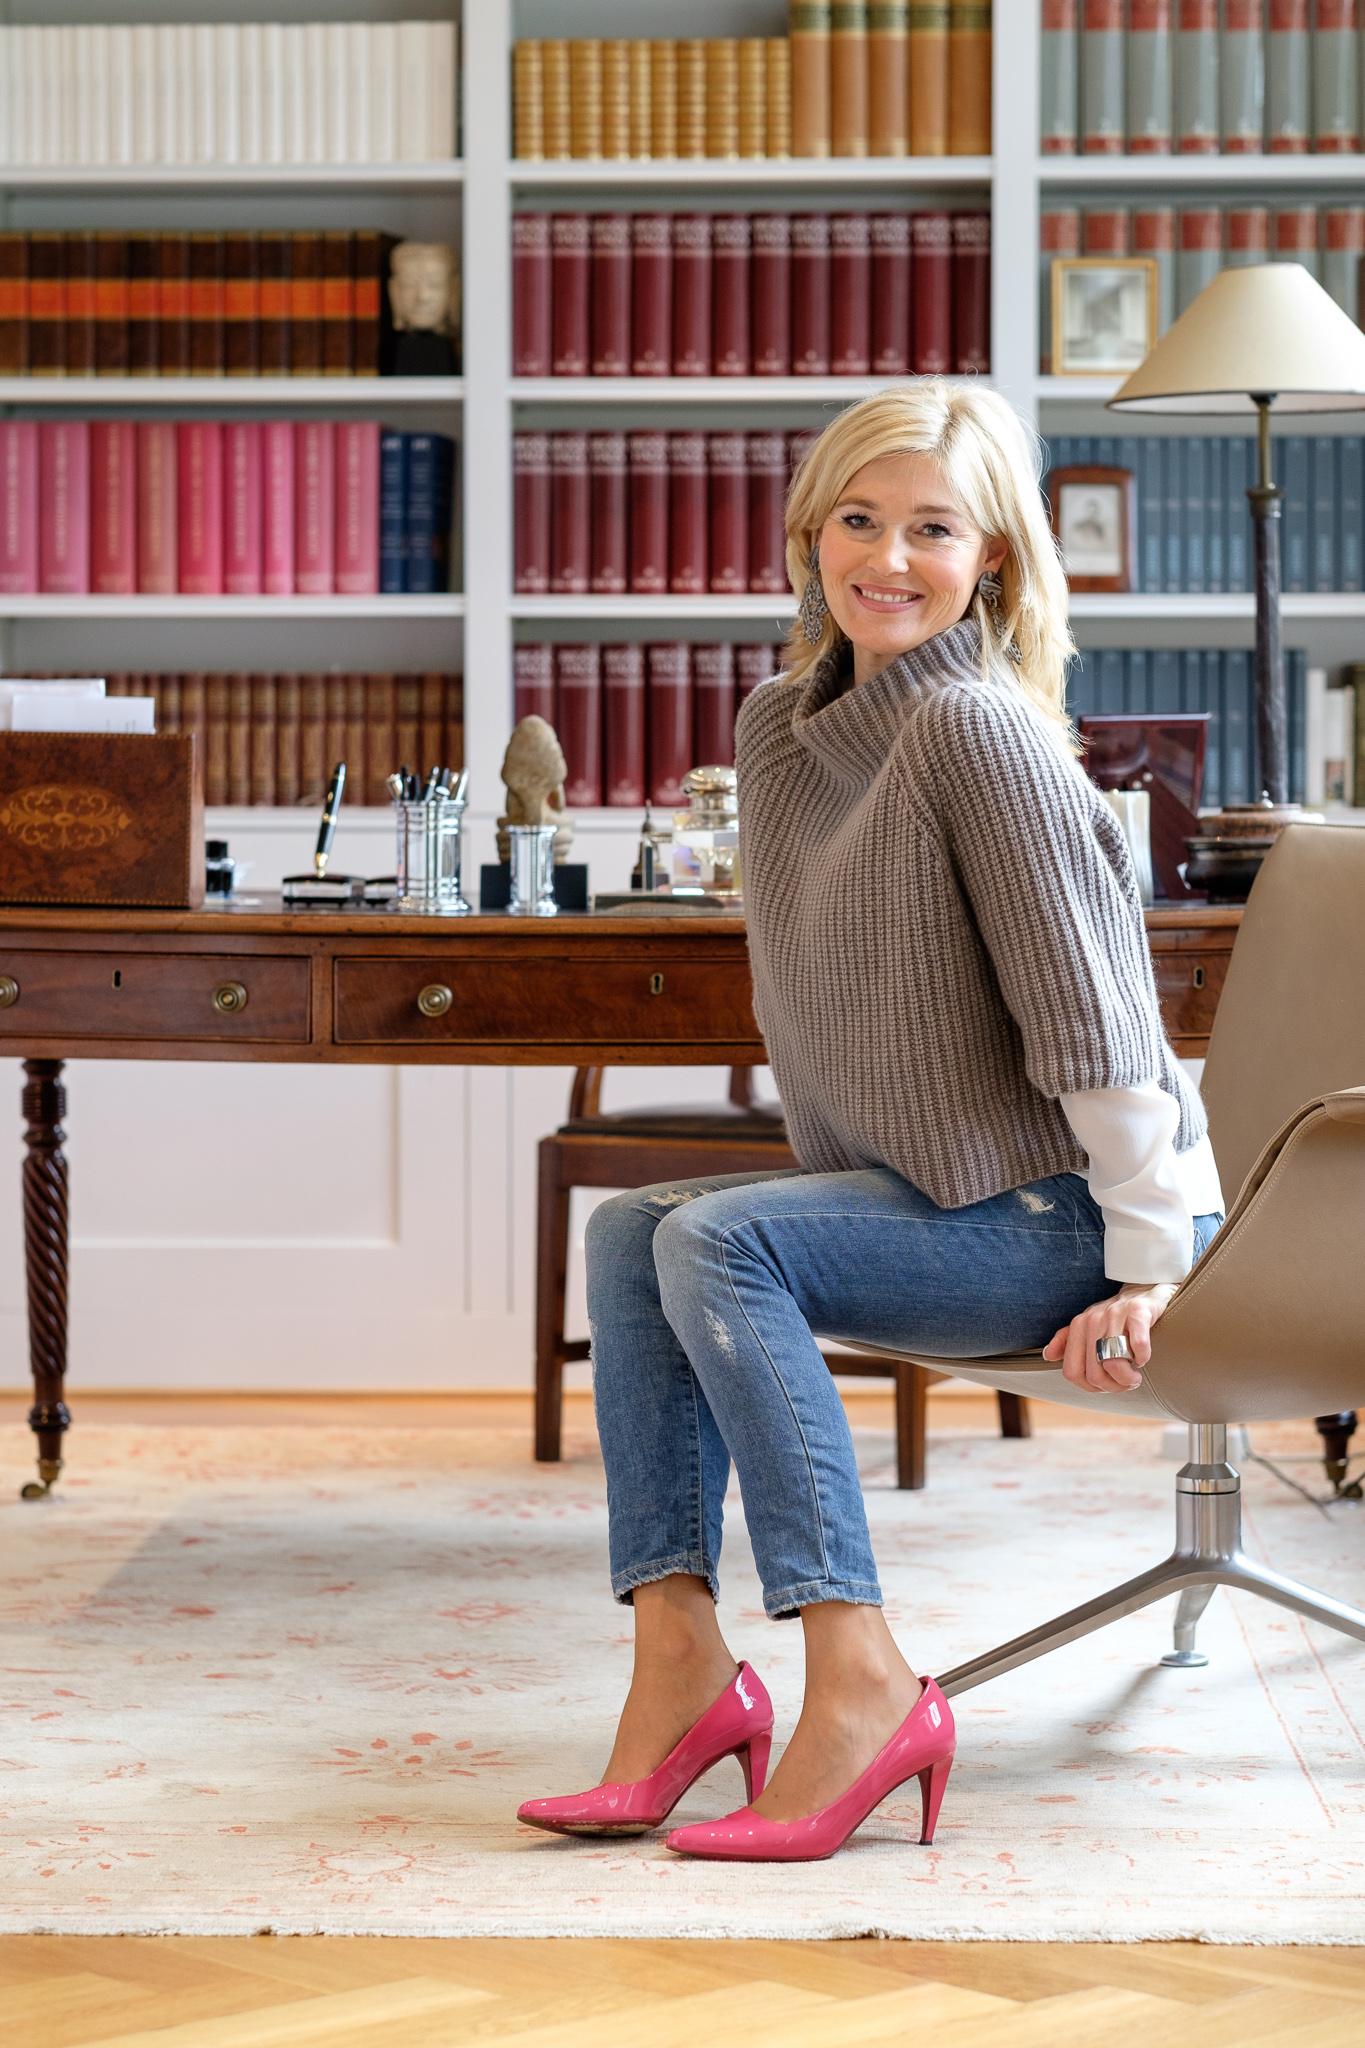 Iris von Armin Sweater, Highlight Schuh, Outfit mit Pep, Please Jeans, knallige Schuhe, Fashionblogger Lieblingsstil, Modeblogger Lieblingsstil